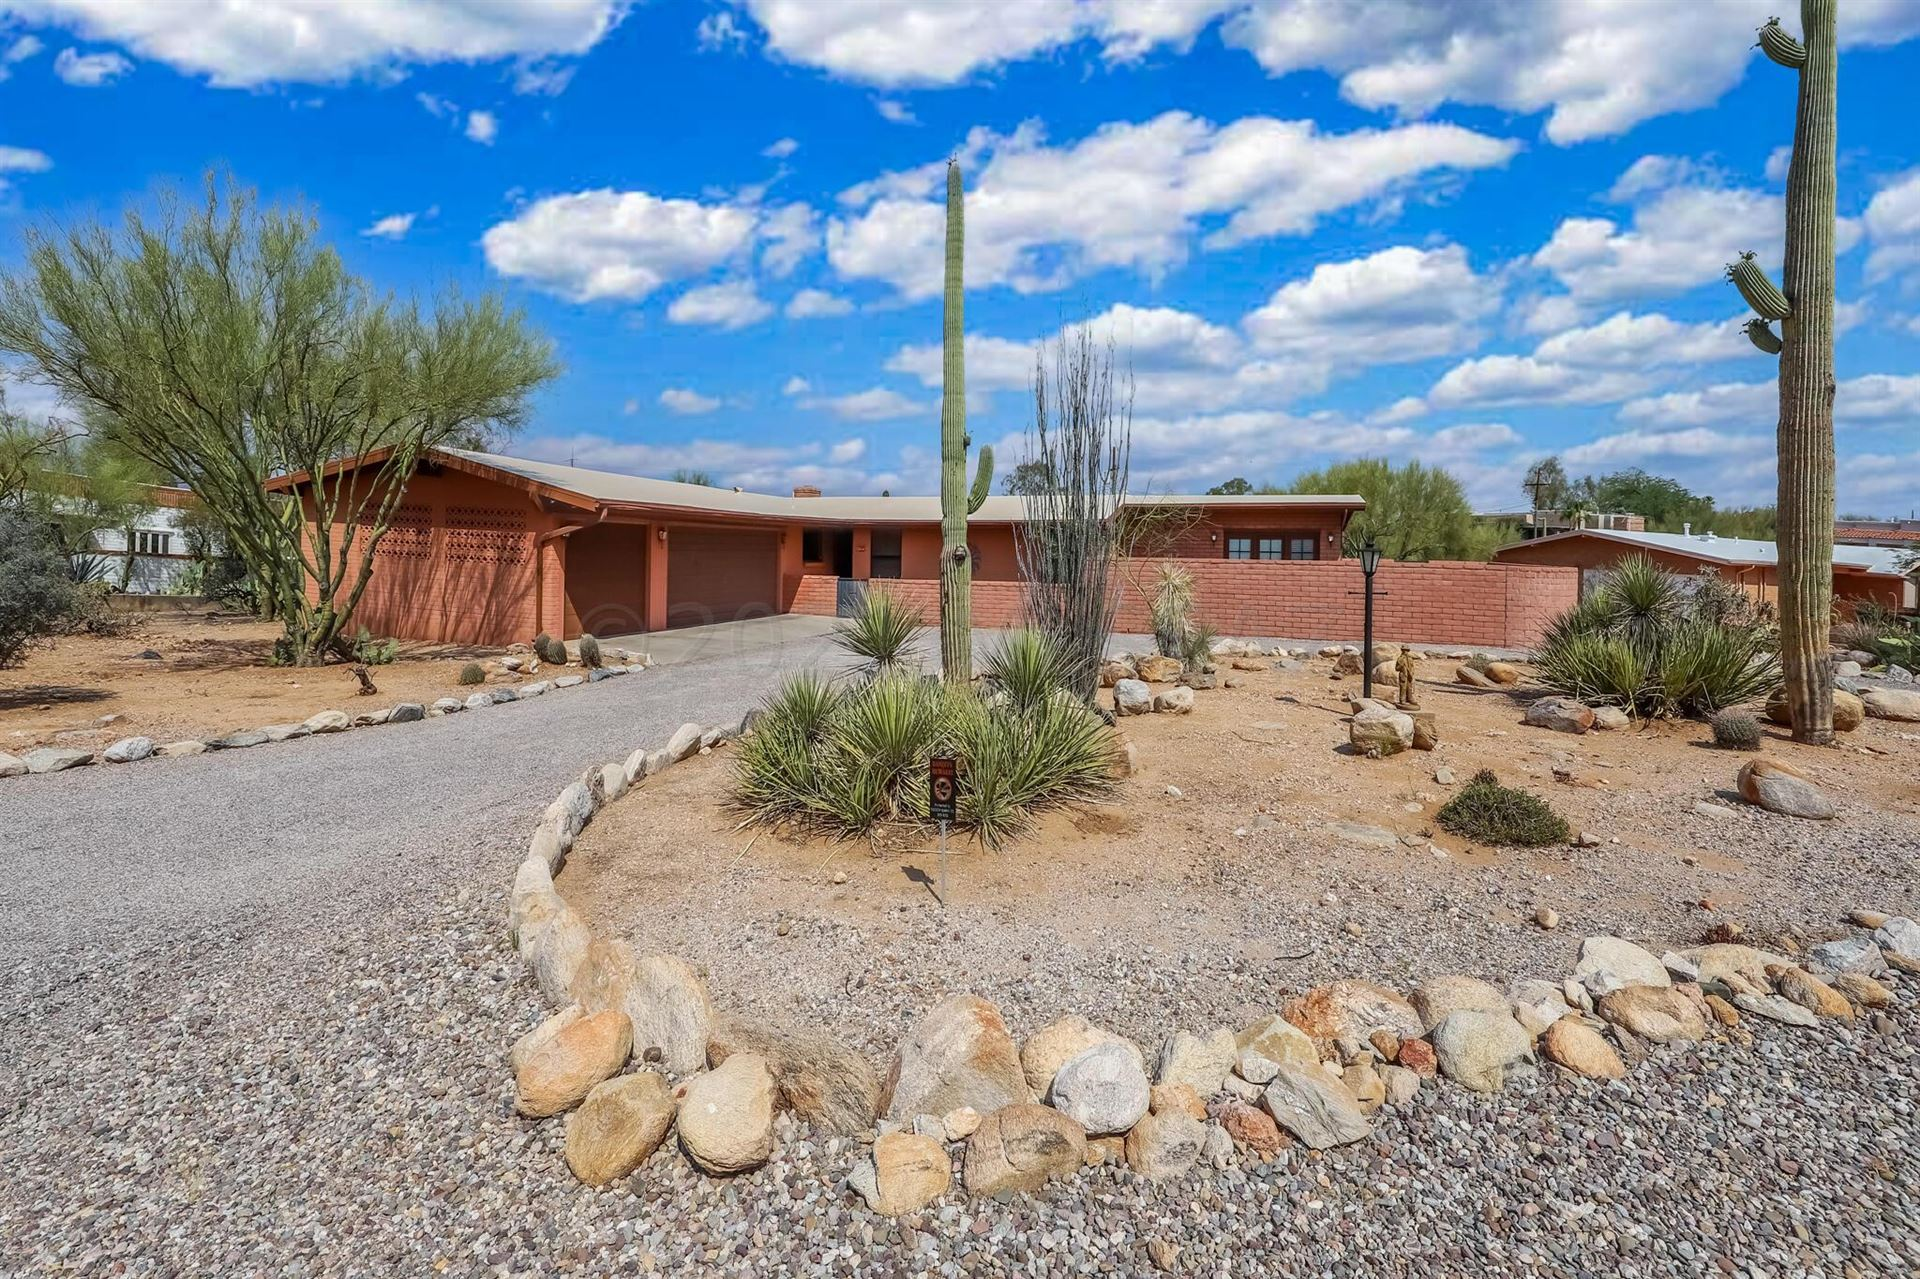 835 E Camino De Fray Marcos, Tucson, AZ 85718 - MLS#: 22115610